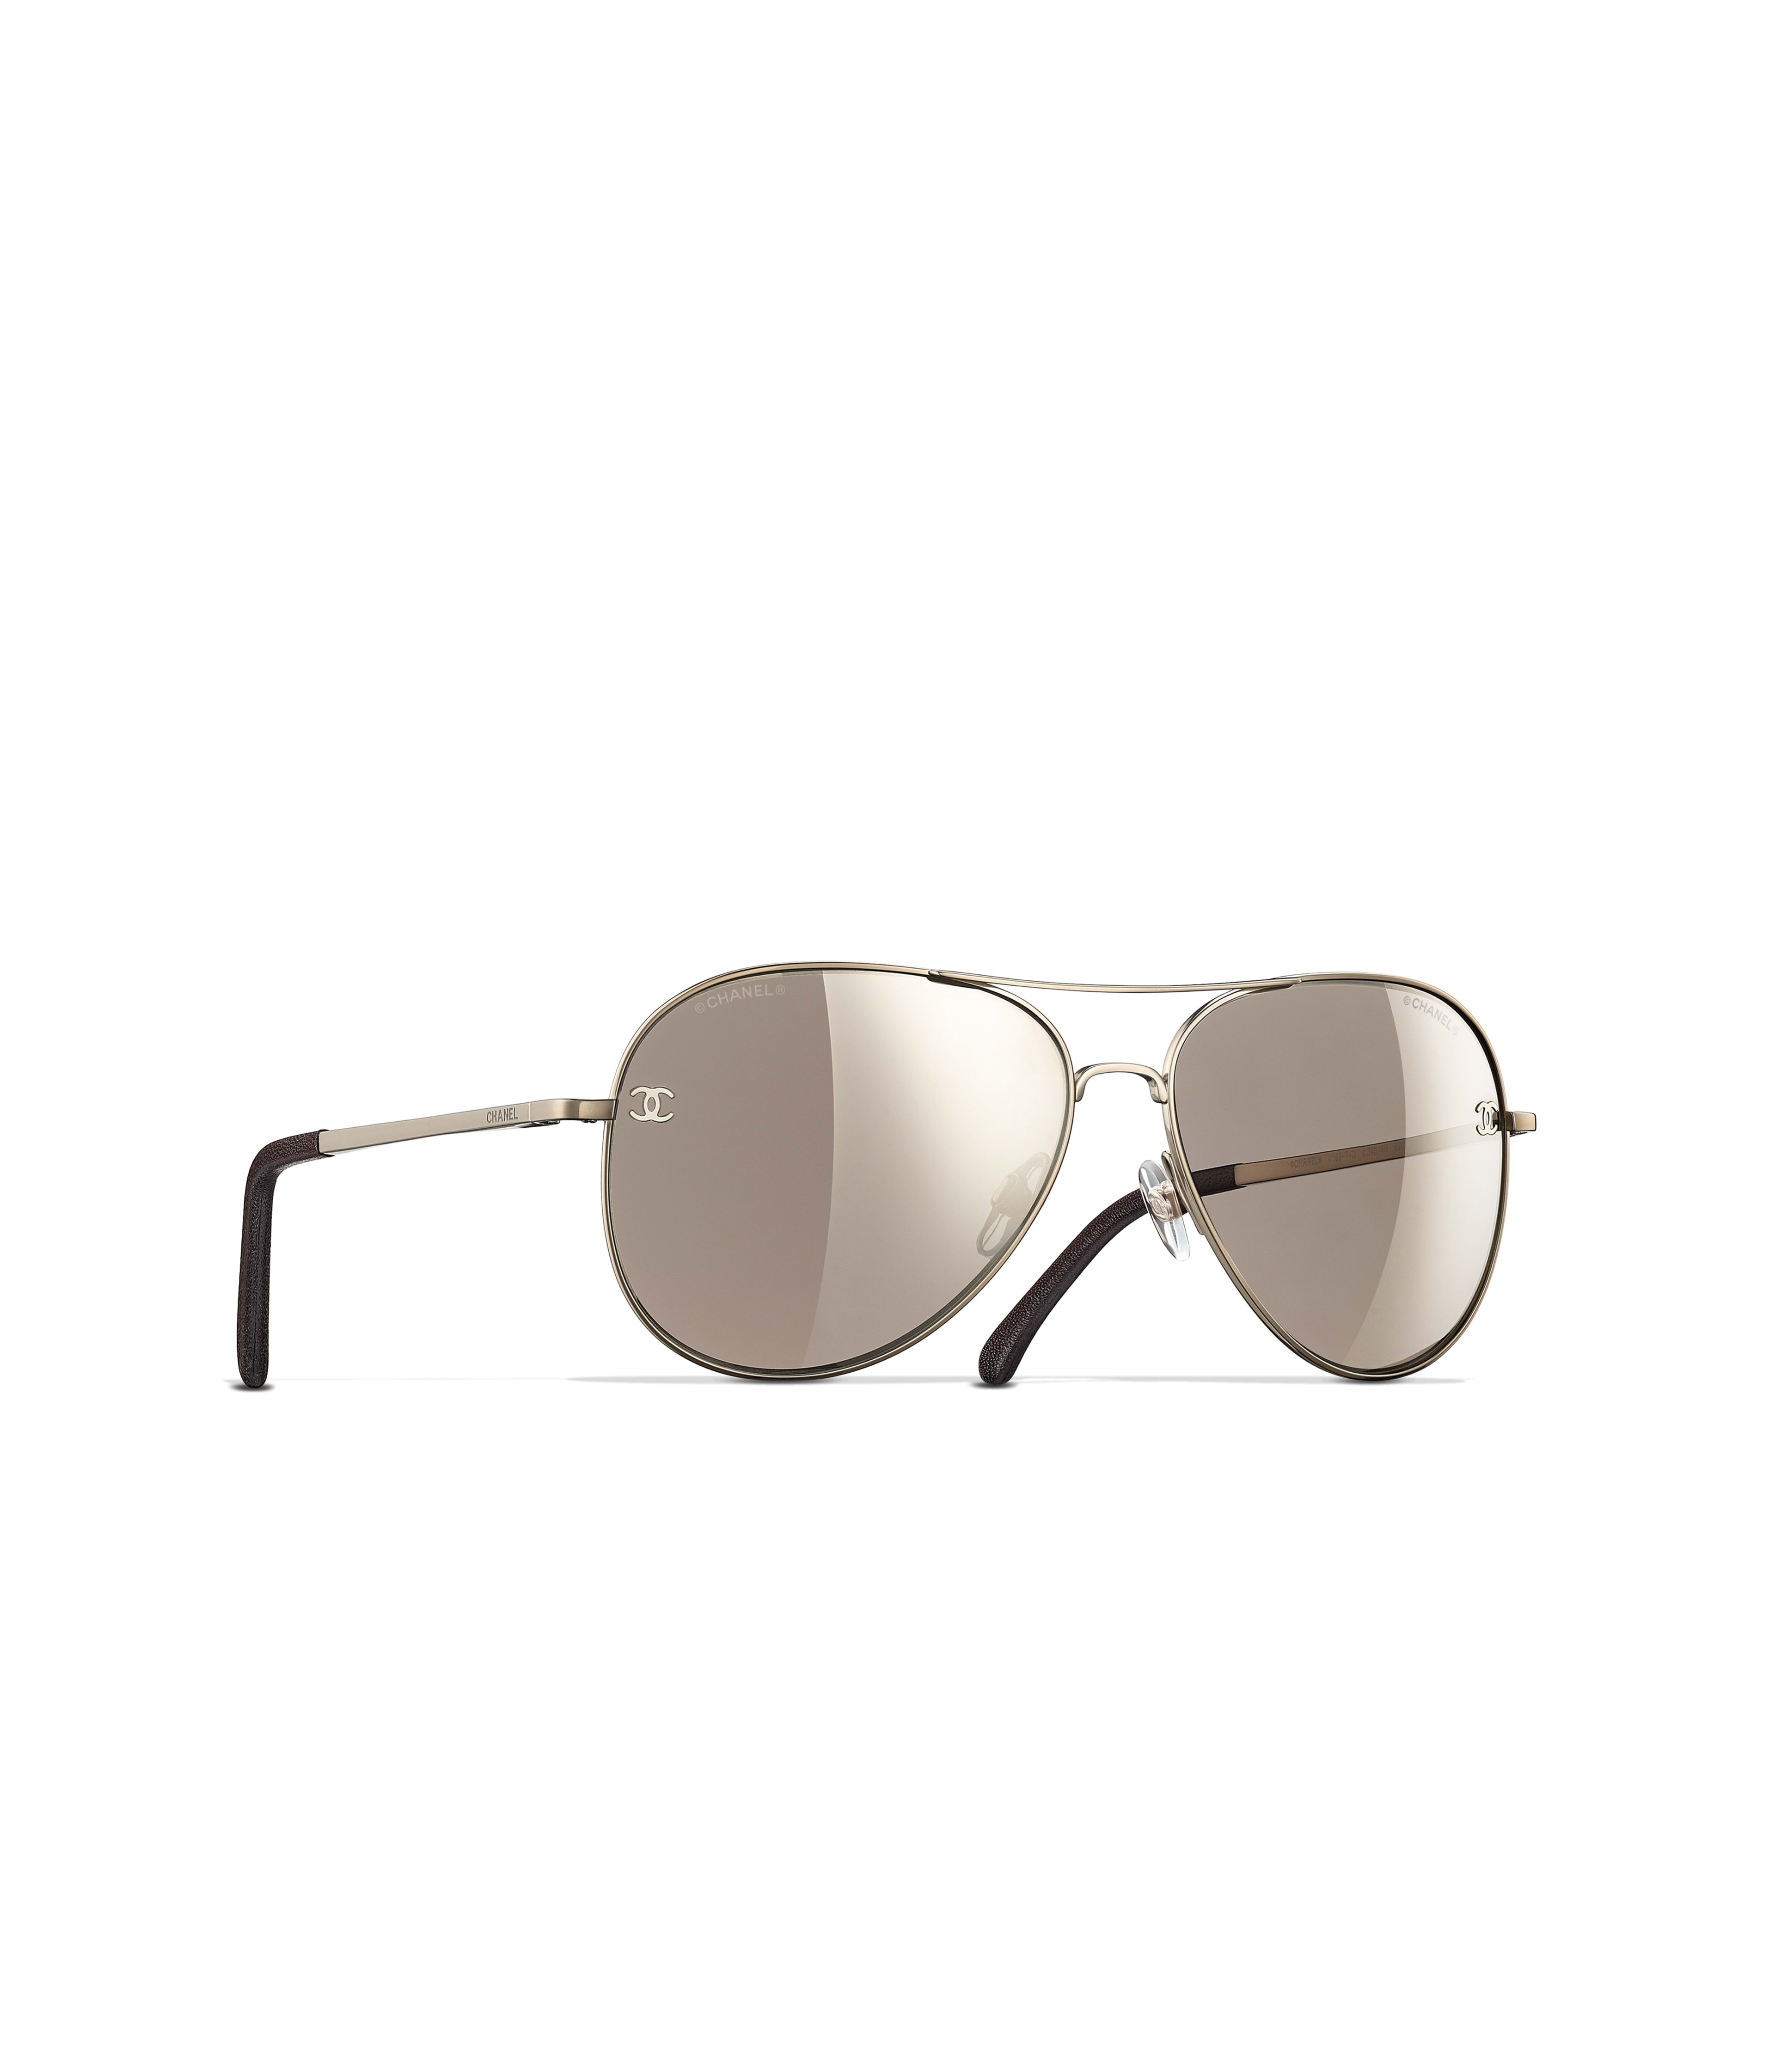 9d17b44a5418 Pilot Sunglasses Ref. 4189TQ C395 6G